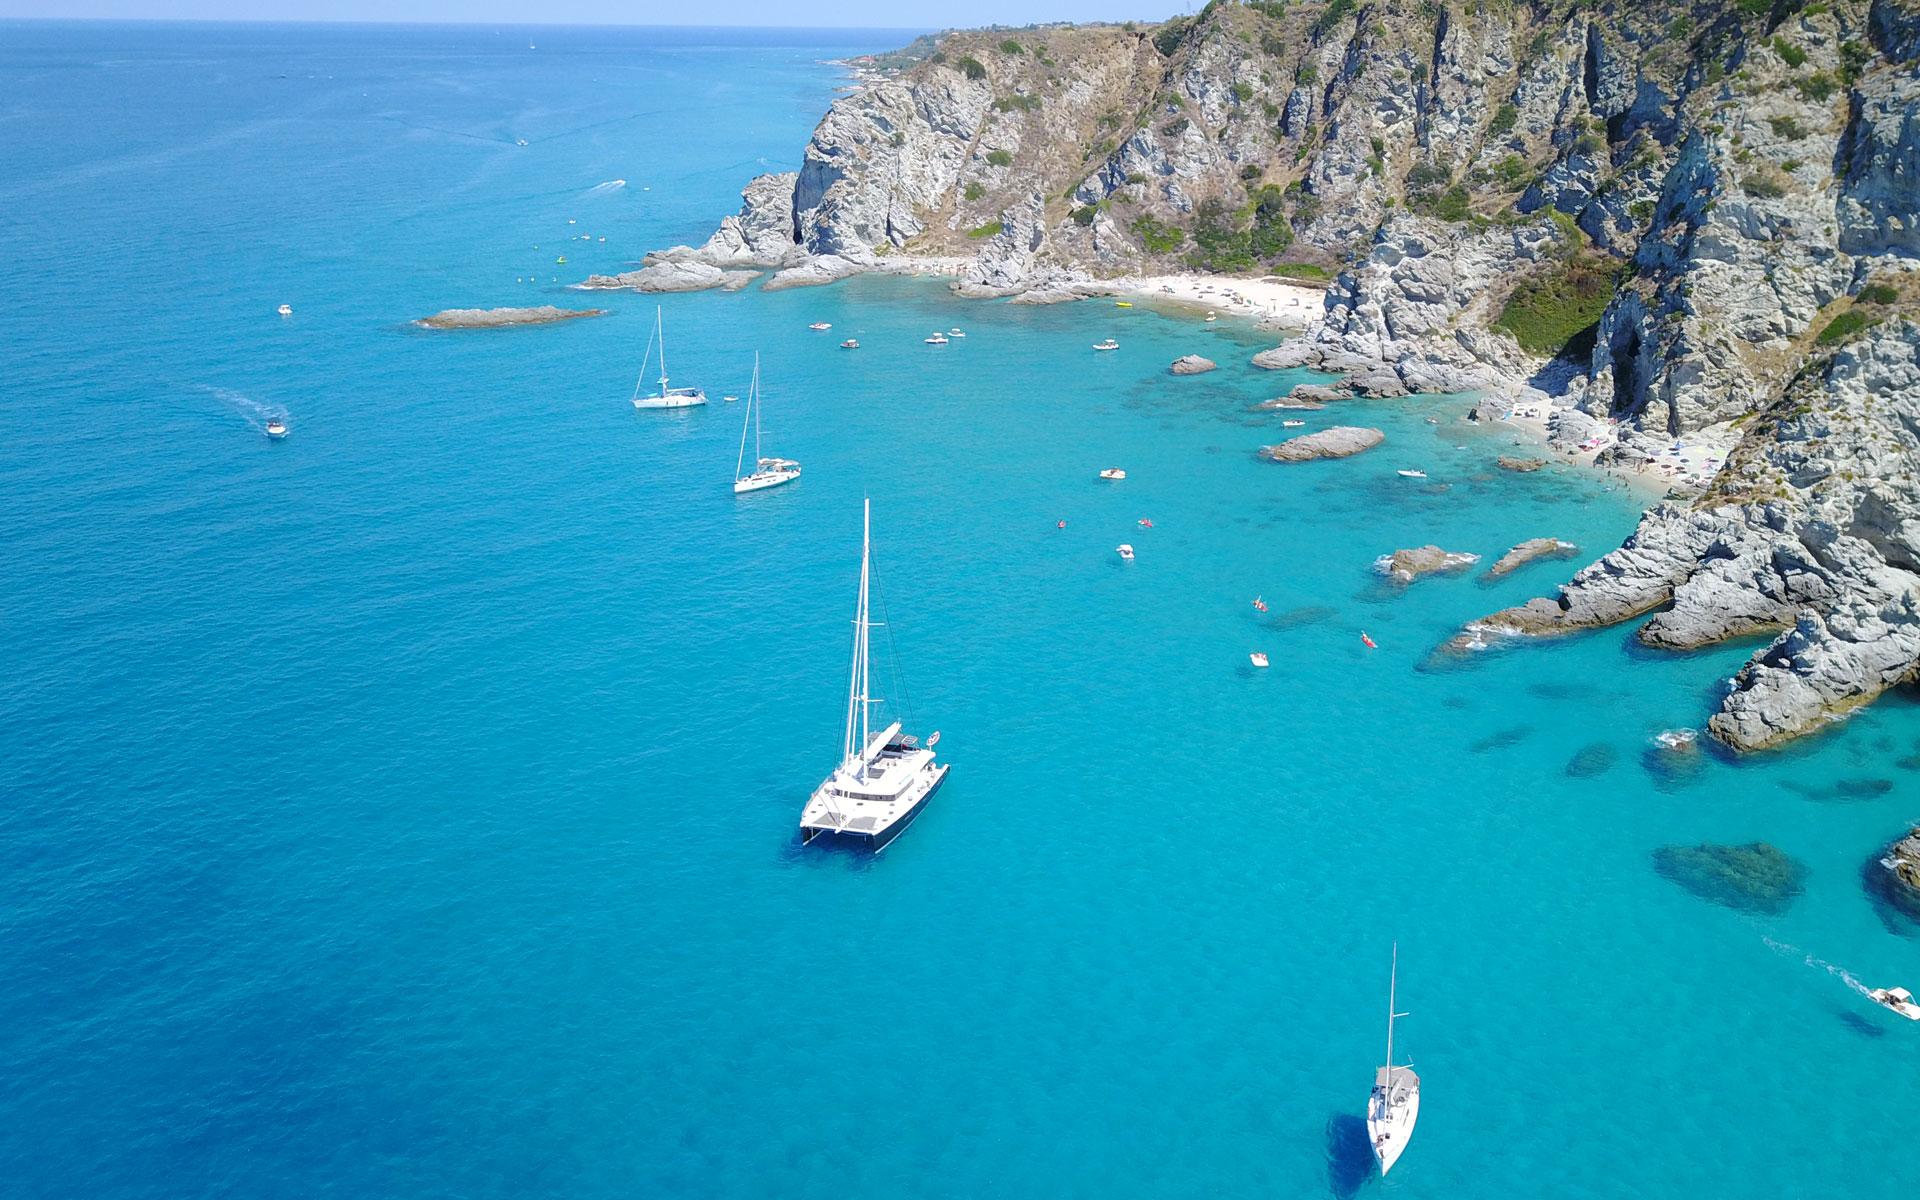 Catamarano Kaskazi - Isole Eolie